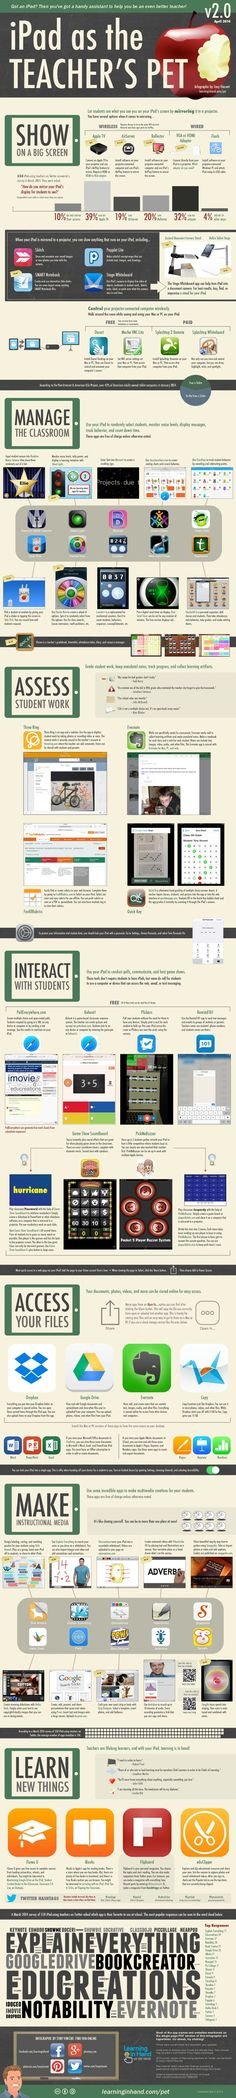 iPad as the Teacher's Pet Version 2.0 Infographic #teachingkidsmath #learnmathonline